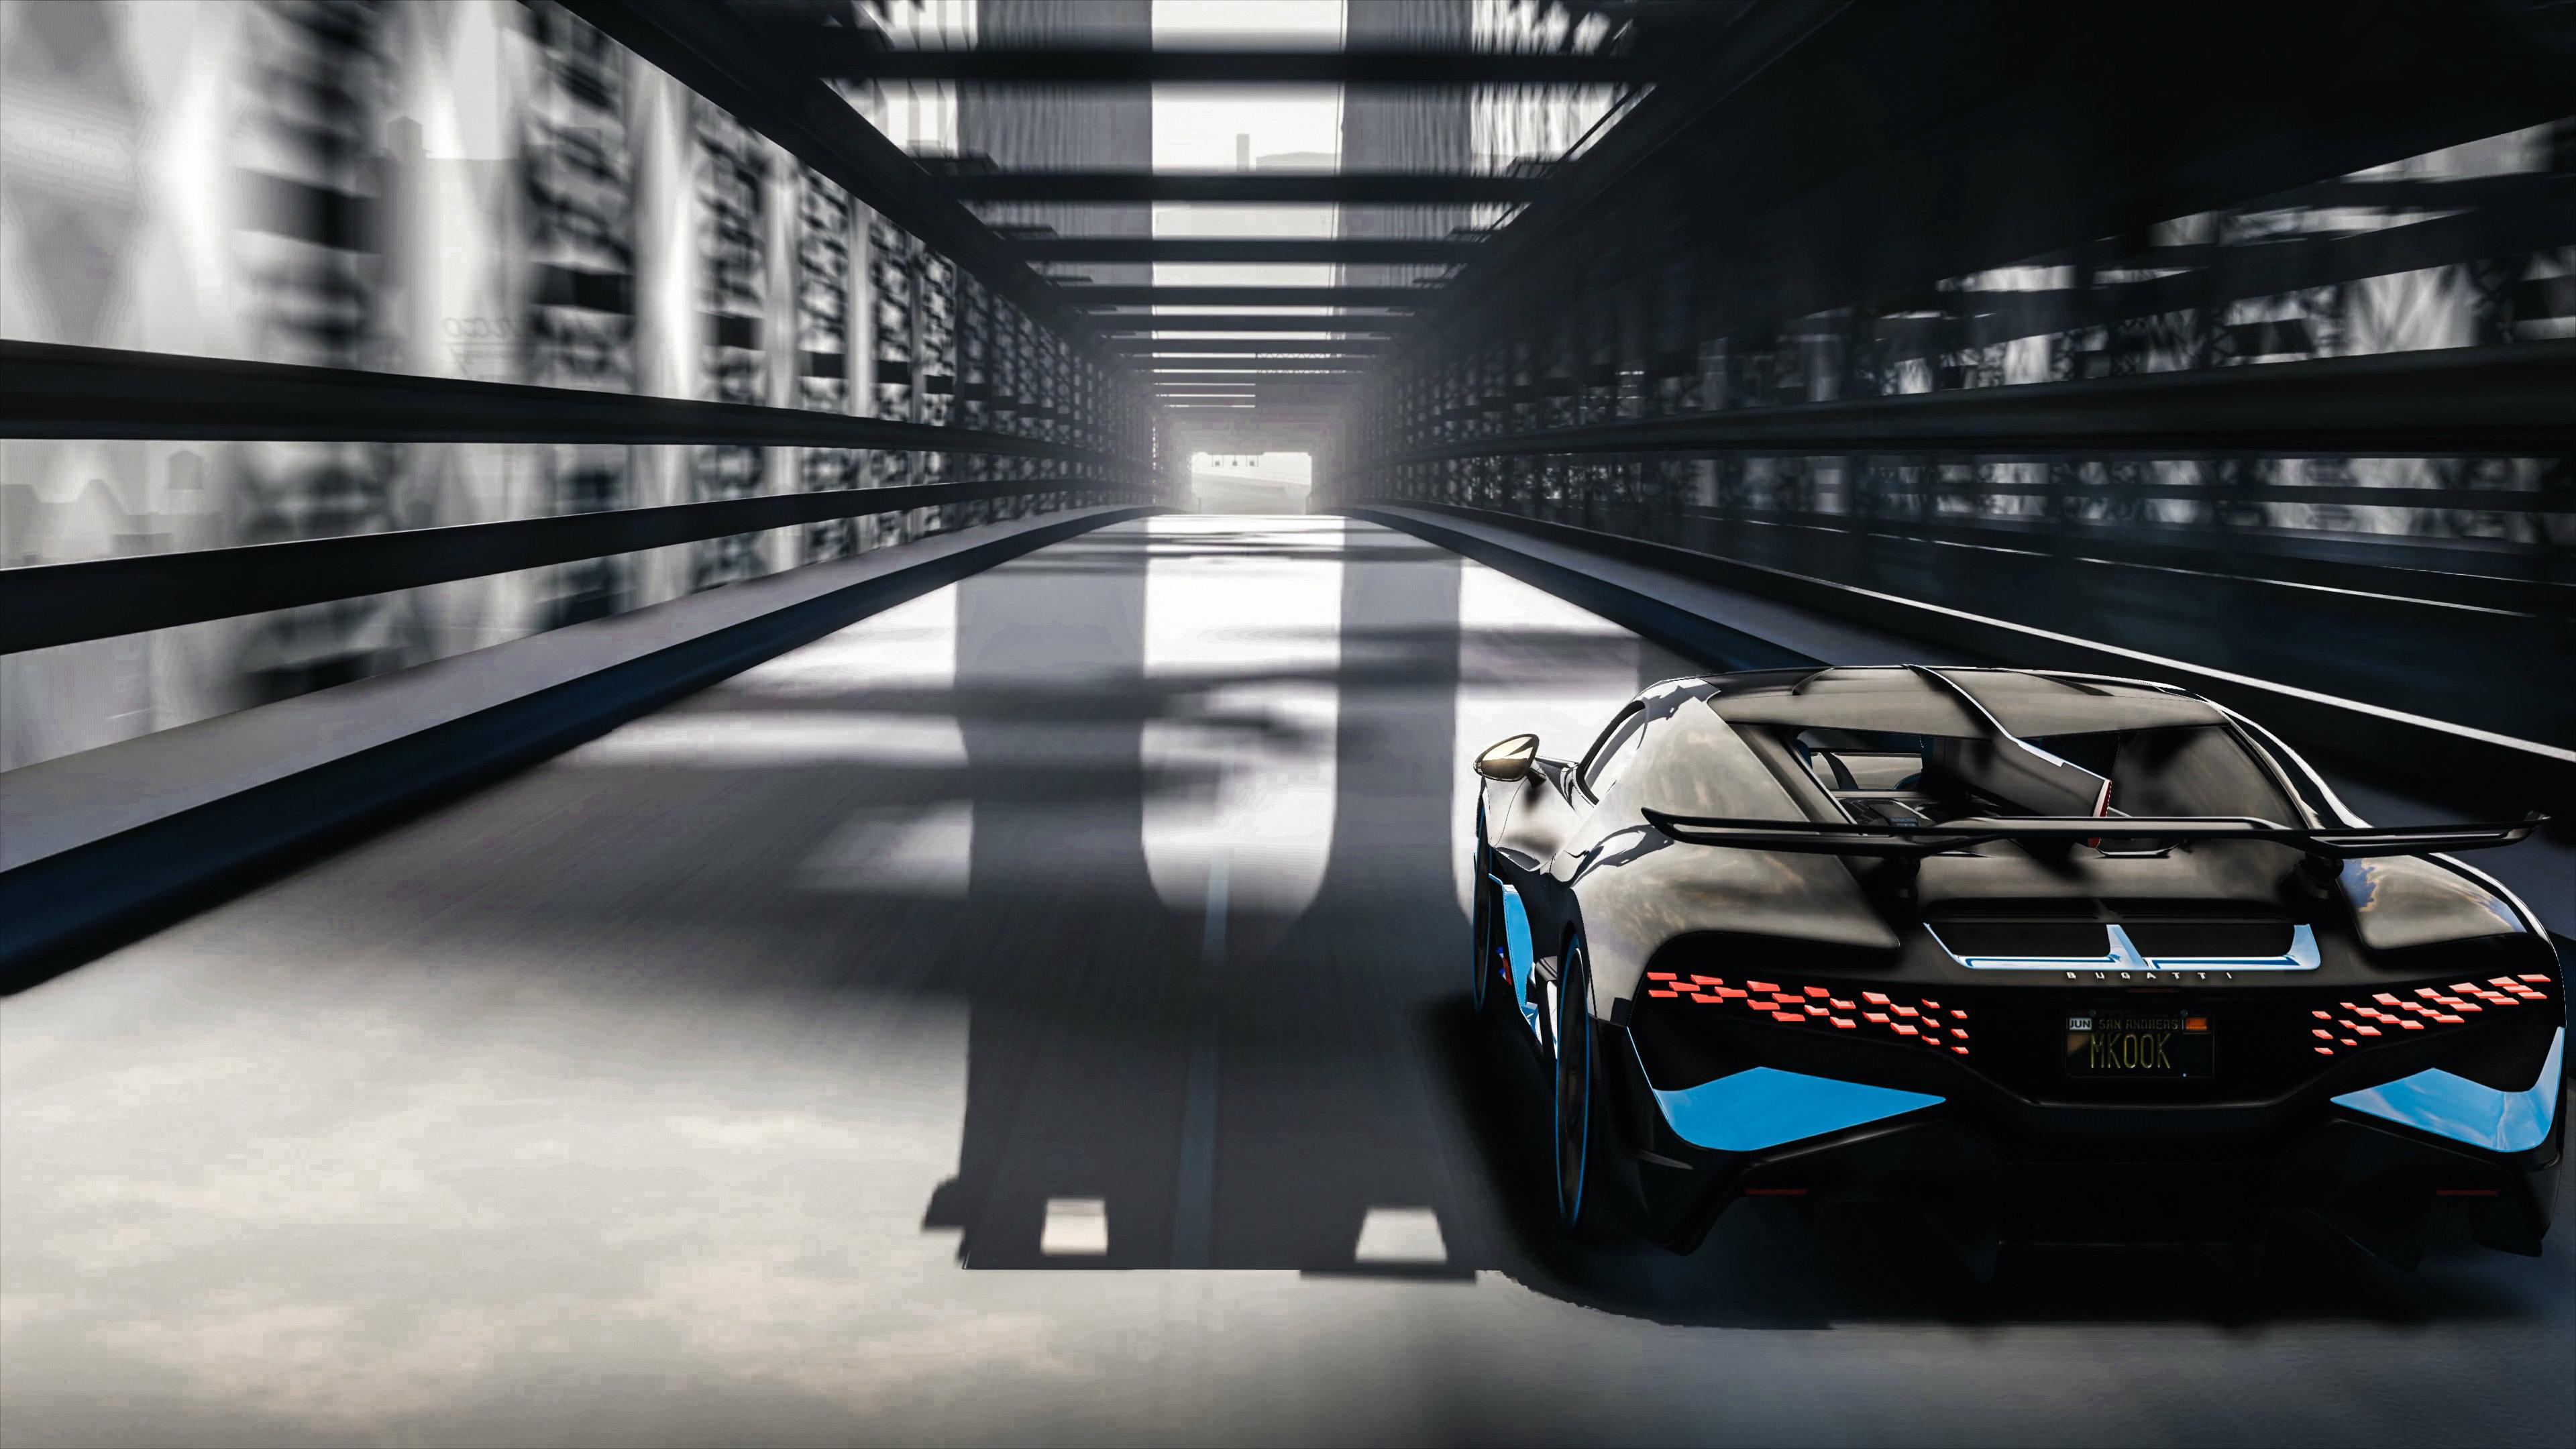 Wallpaper 4k Bugatti Divo Bridge 4k 2018 2018 Cars Wallpapers 4k